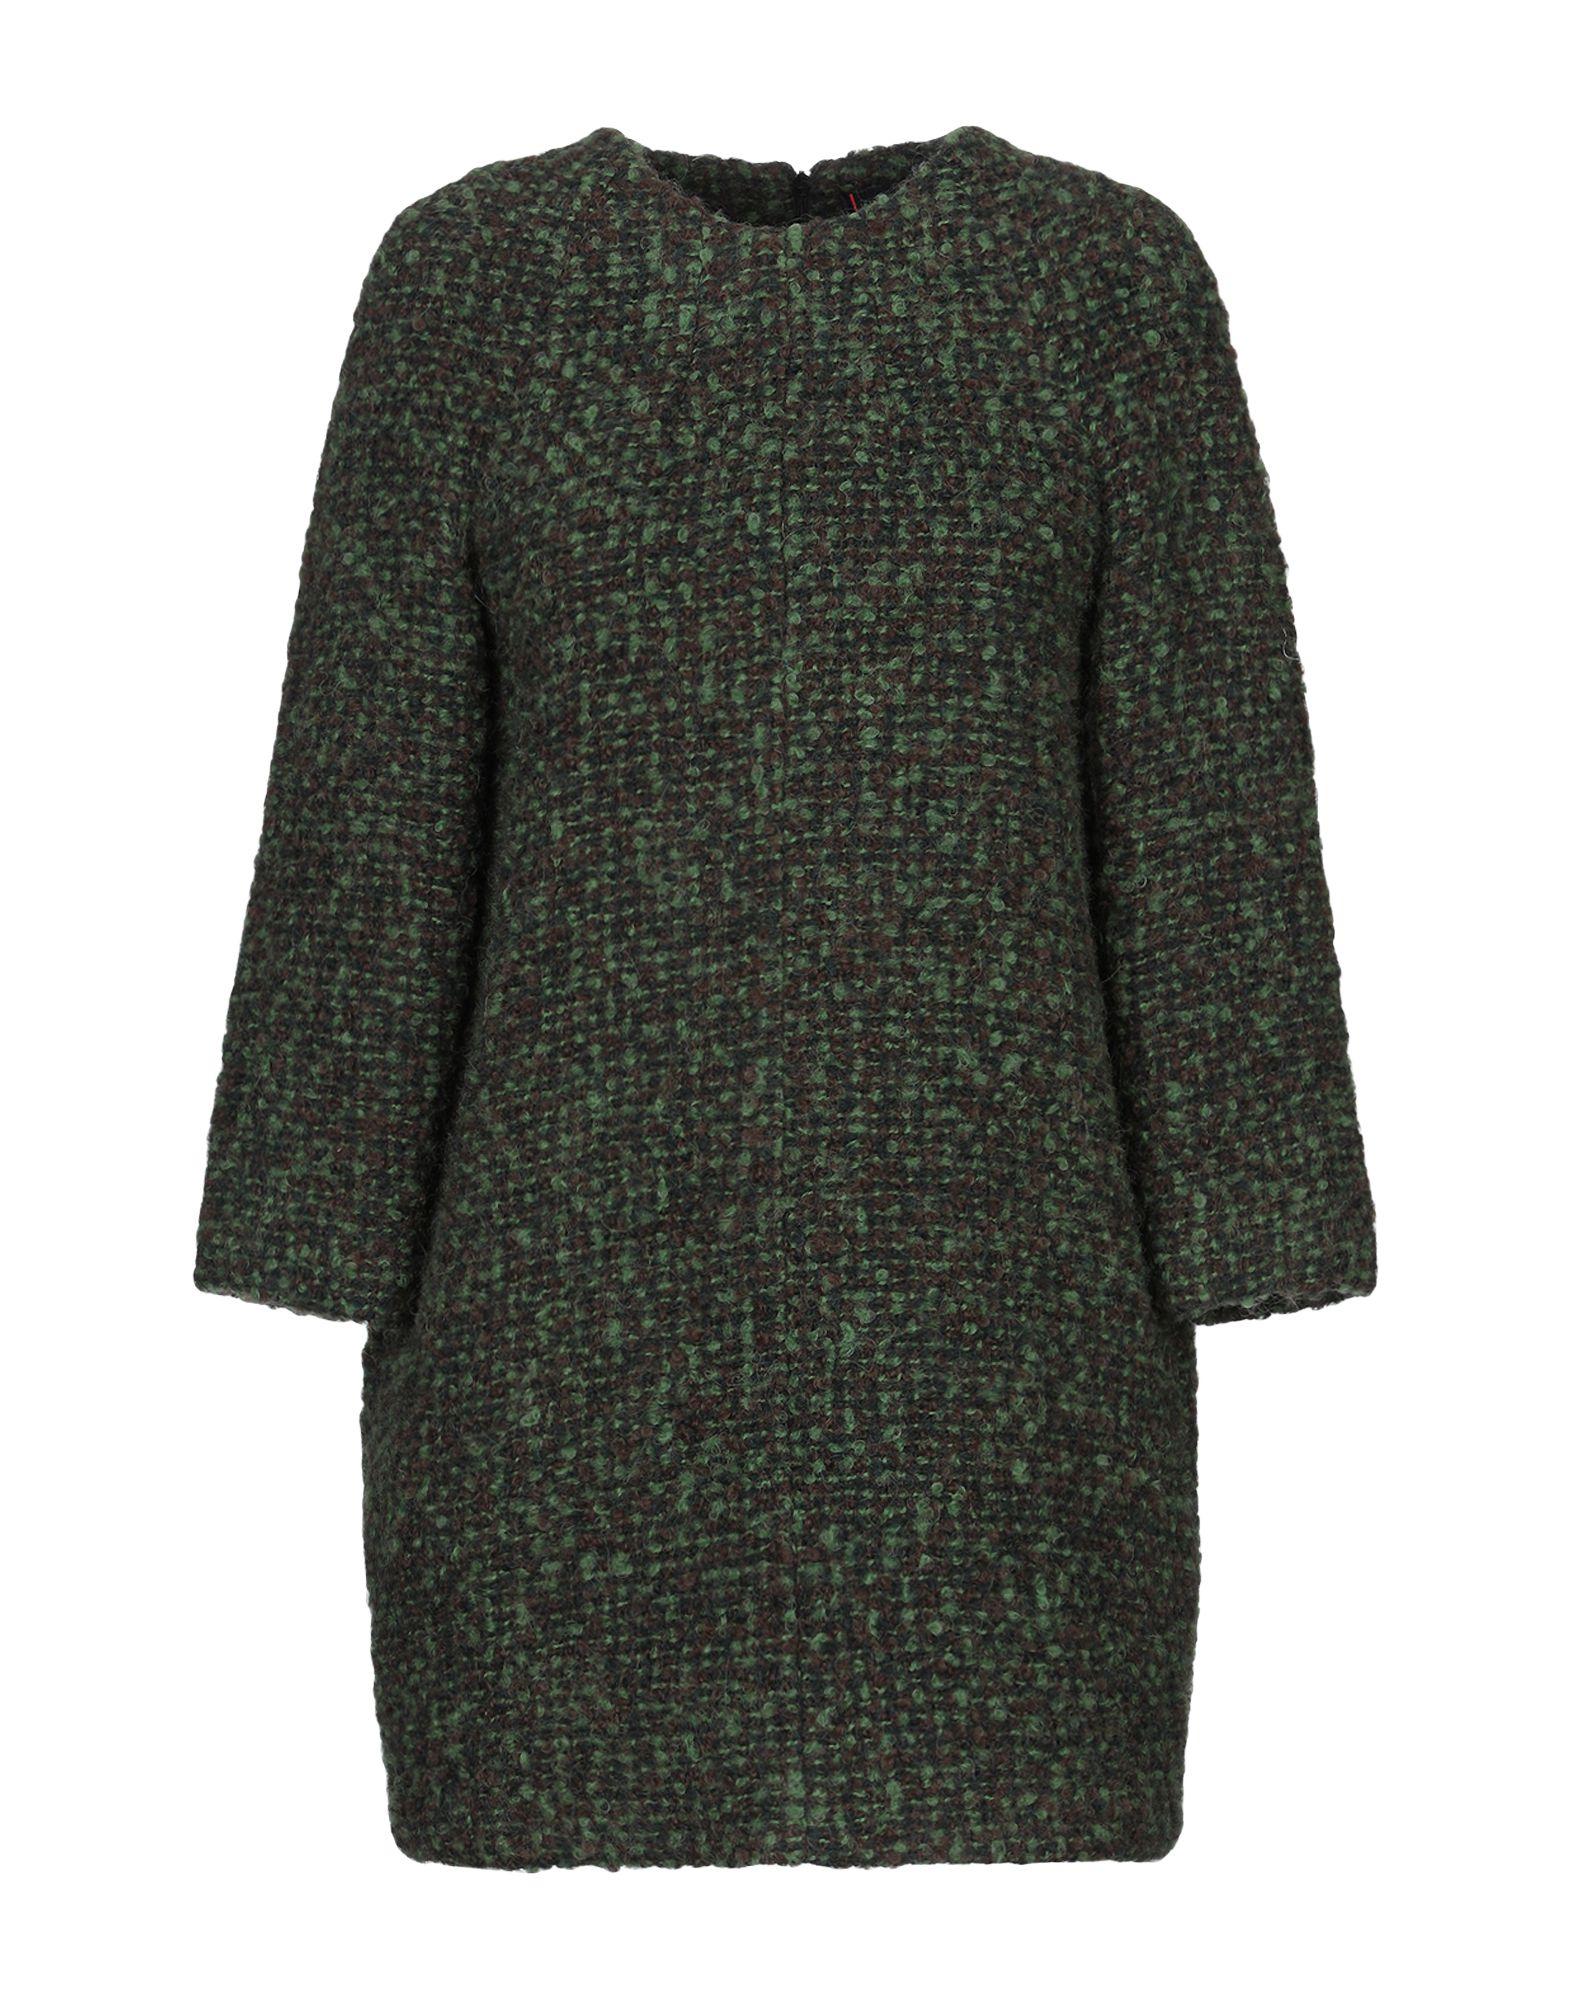 FEMME by MICHELE ROSSI Короткое платье недорго, оригинальная цена